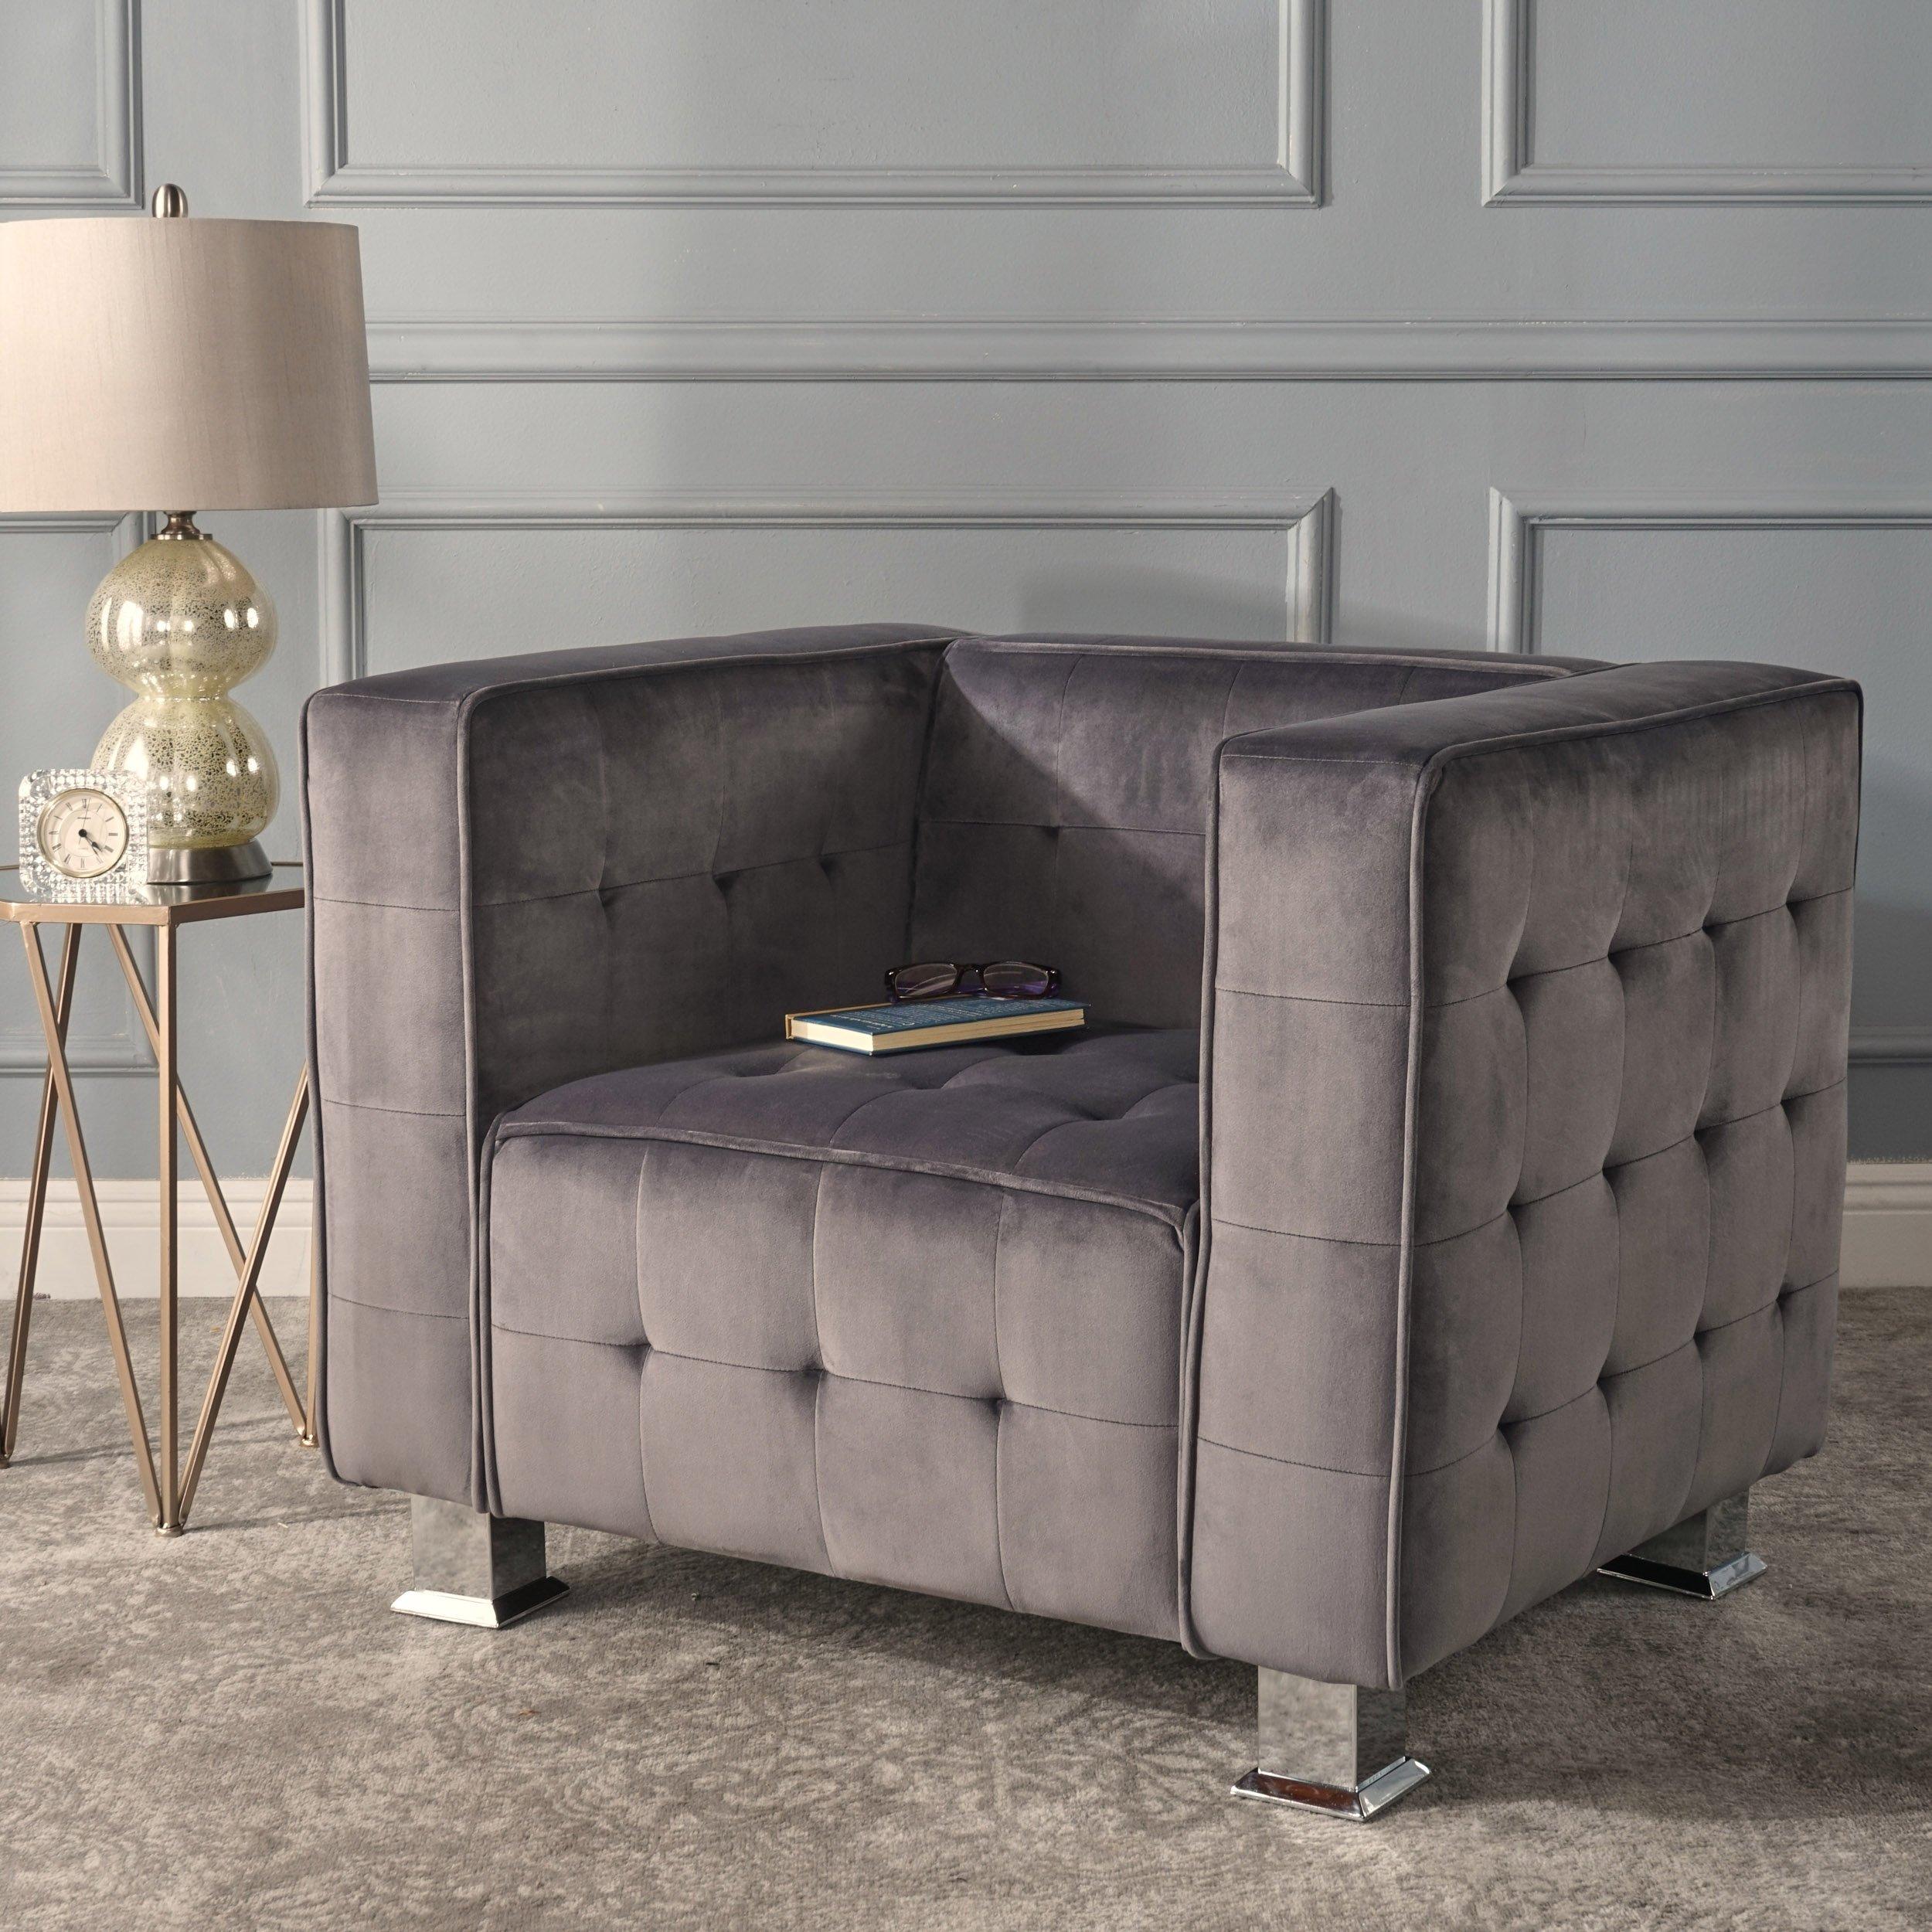 Awe Inspiring Details About Modern Contemporary Grey Velvet Art Deco Chair Tufted Cube Armchair Chrome Legs Uwap Interior Chair Design Uwaporg